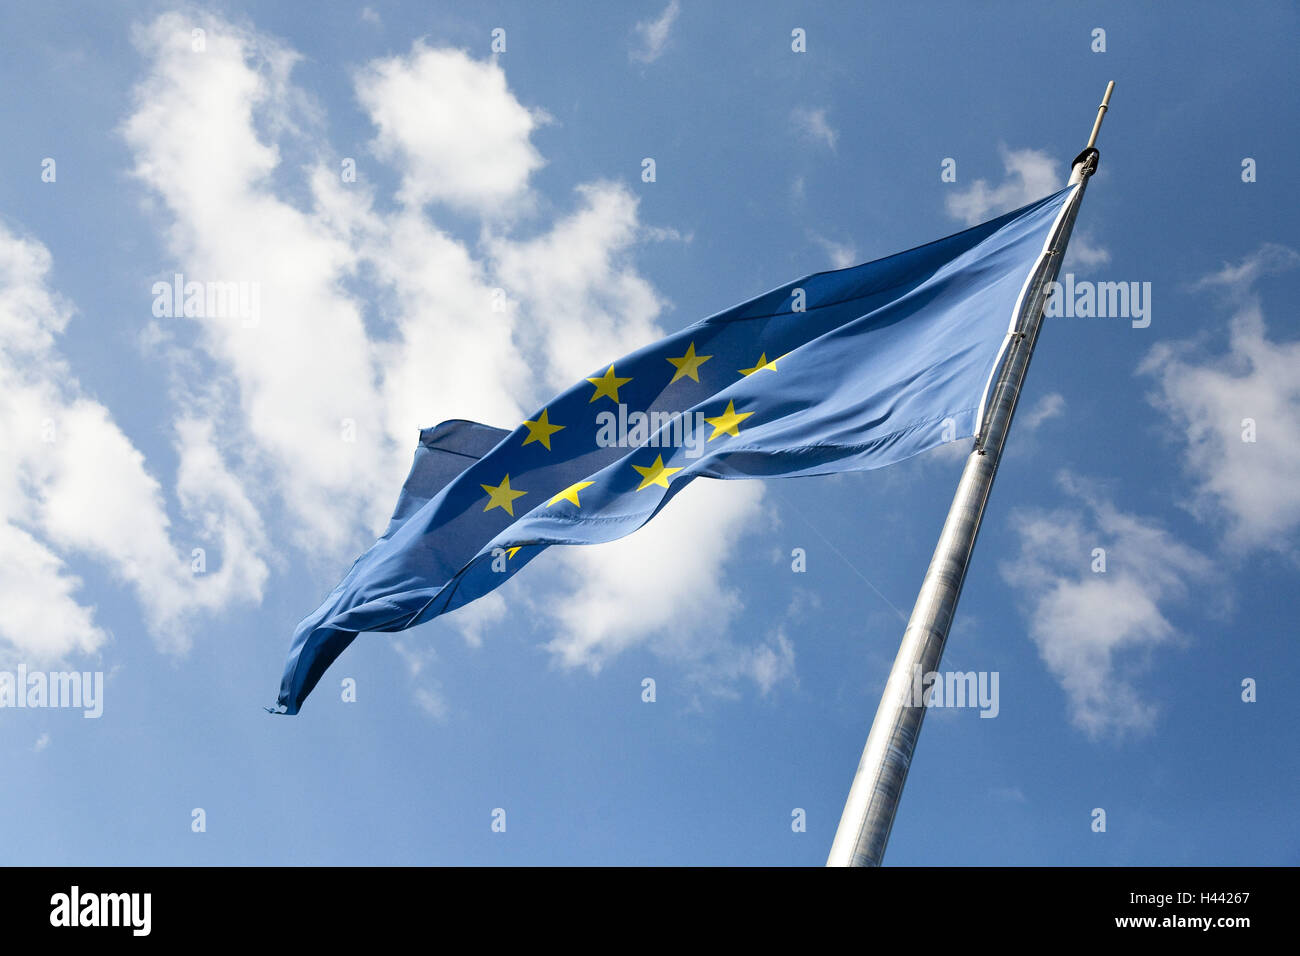 Flagpole, European flag, wind, cloudy sky, - Stock Image